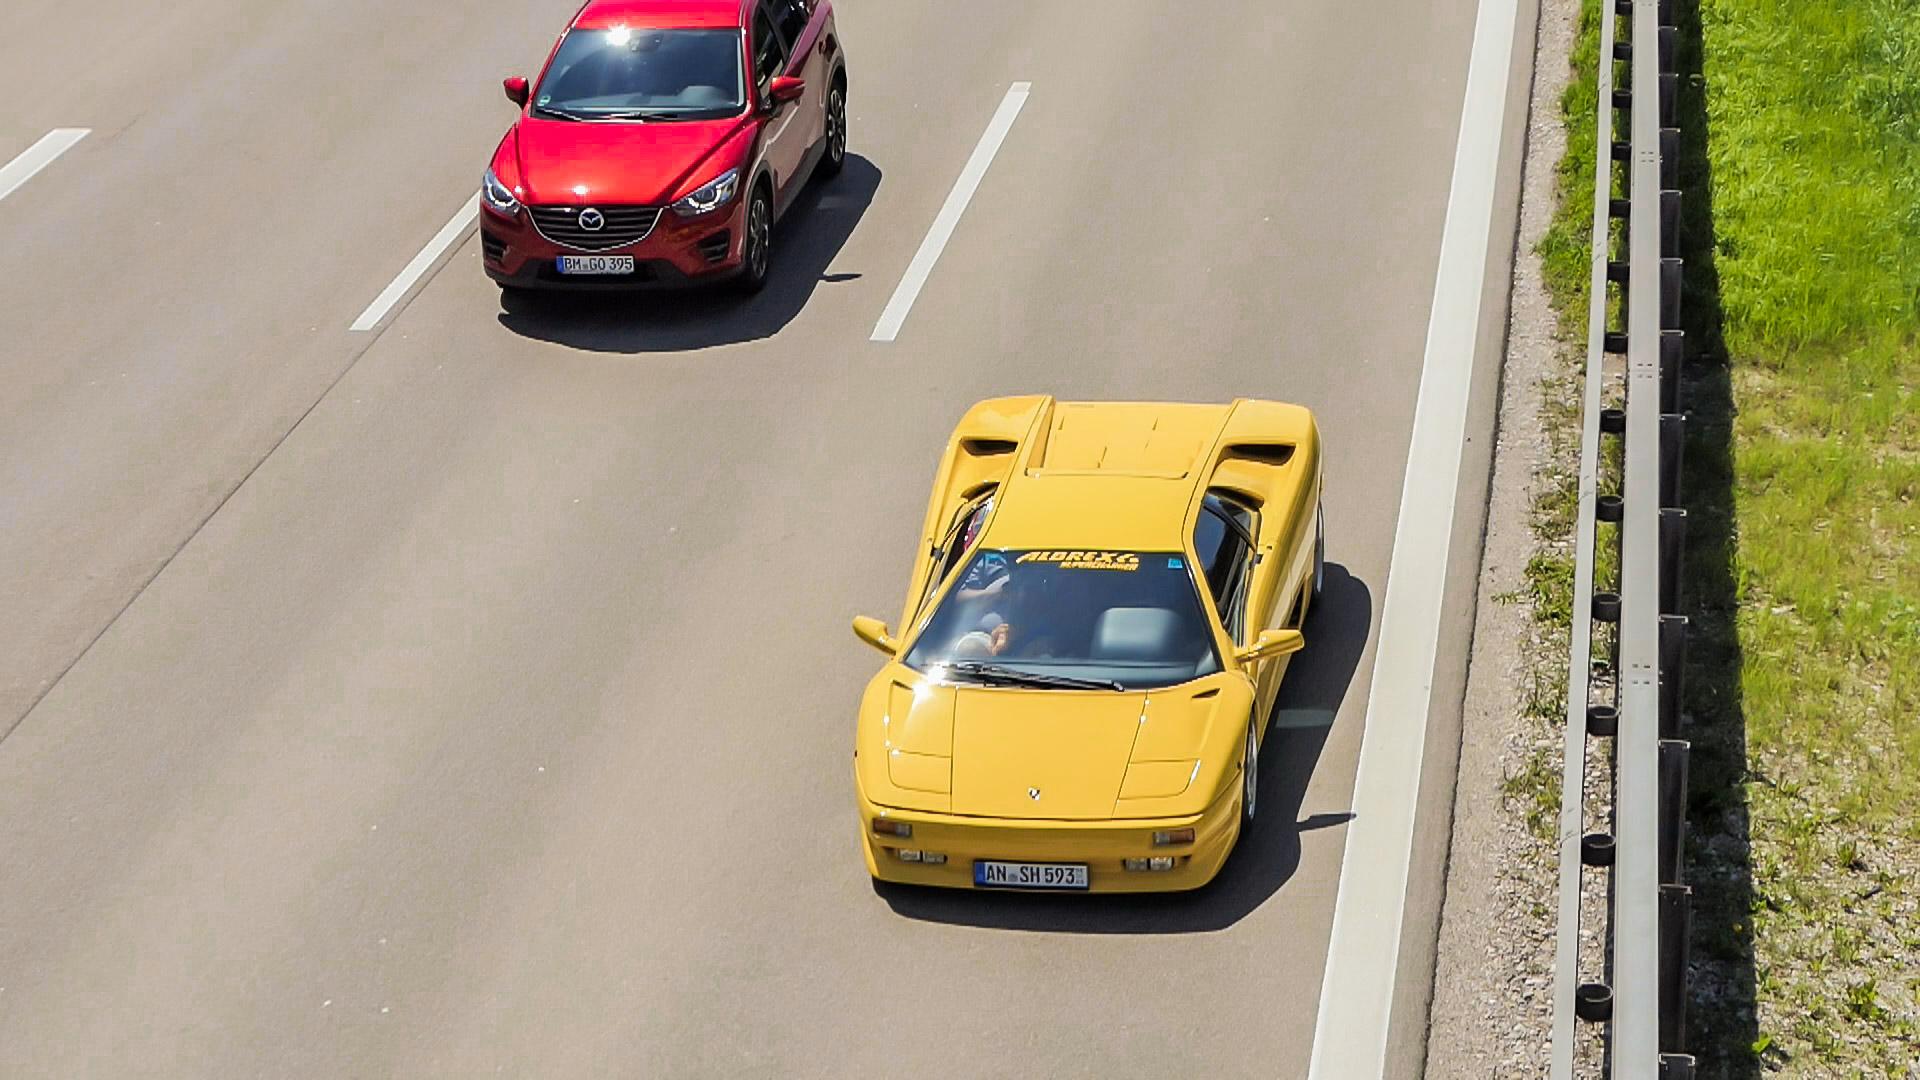 Lamborghini Diablo - AN-SH-593